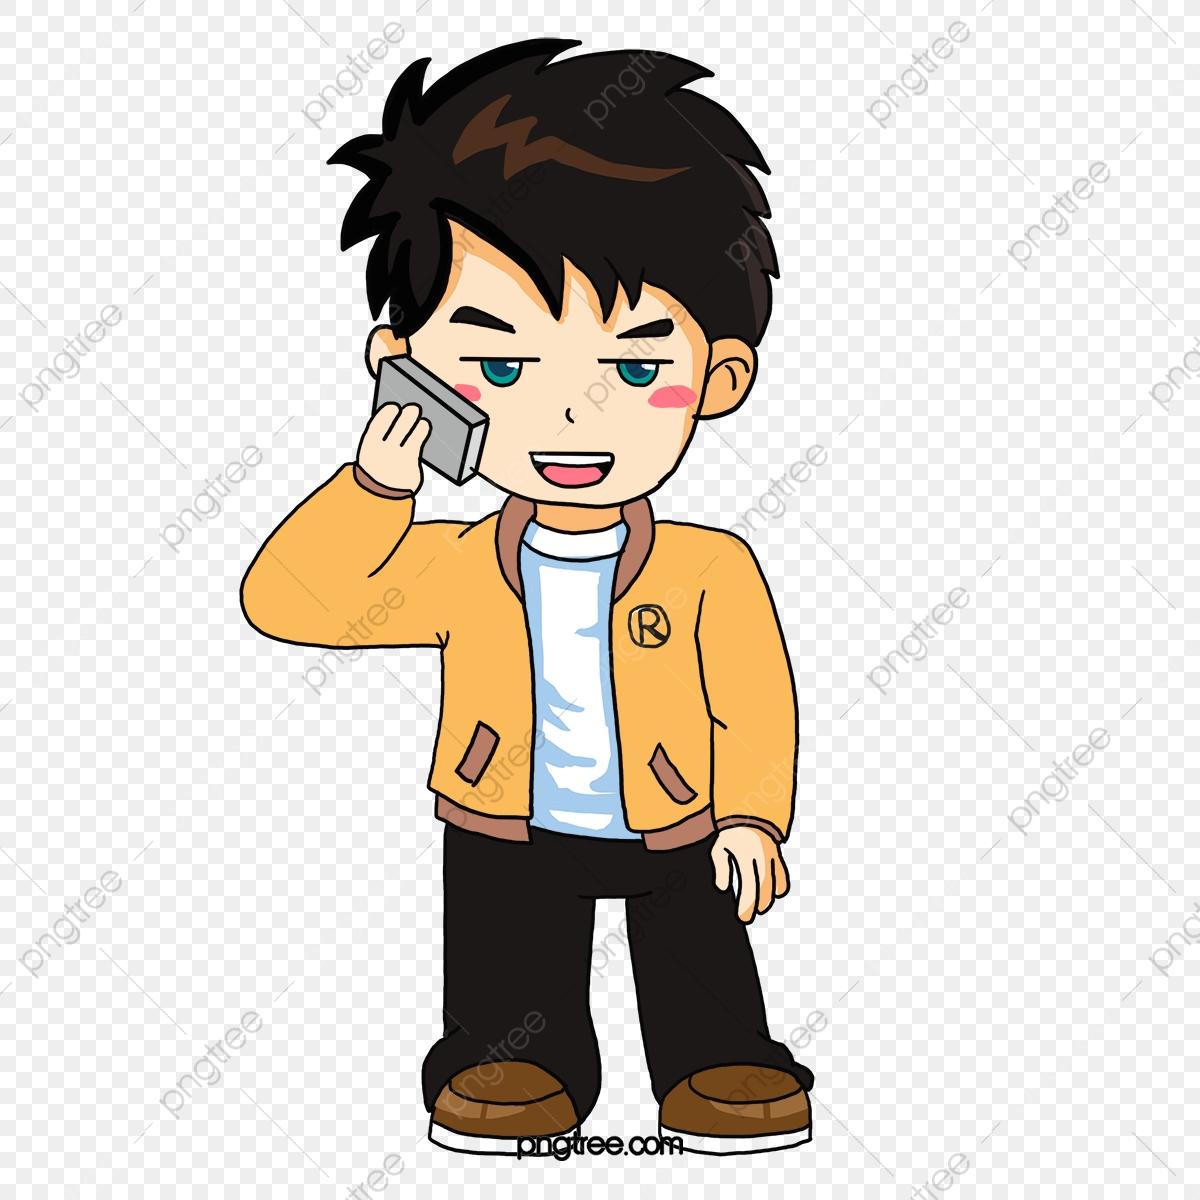 Call Boy, Boy Clipart, Cartoon Characters, Illustration PNG.